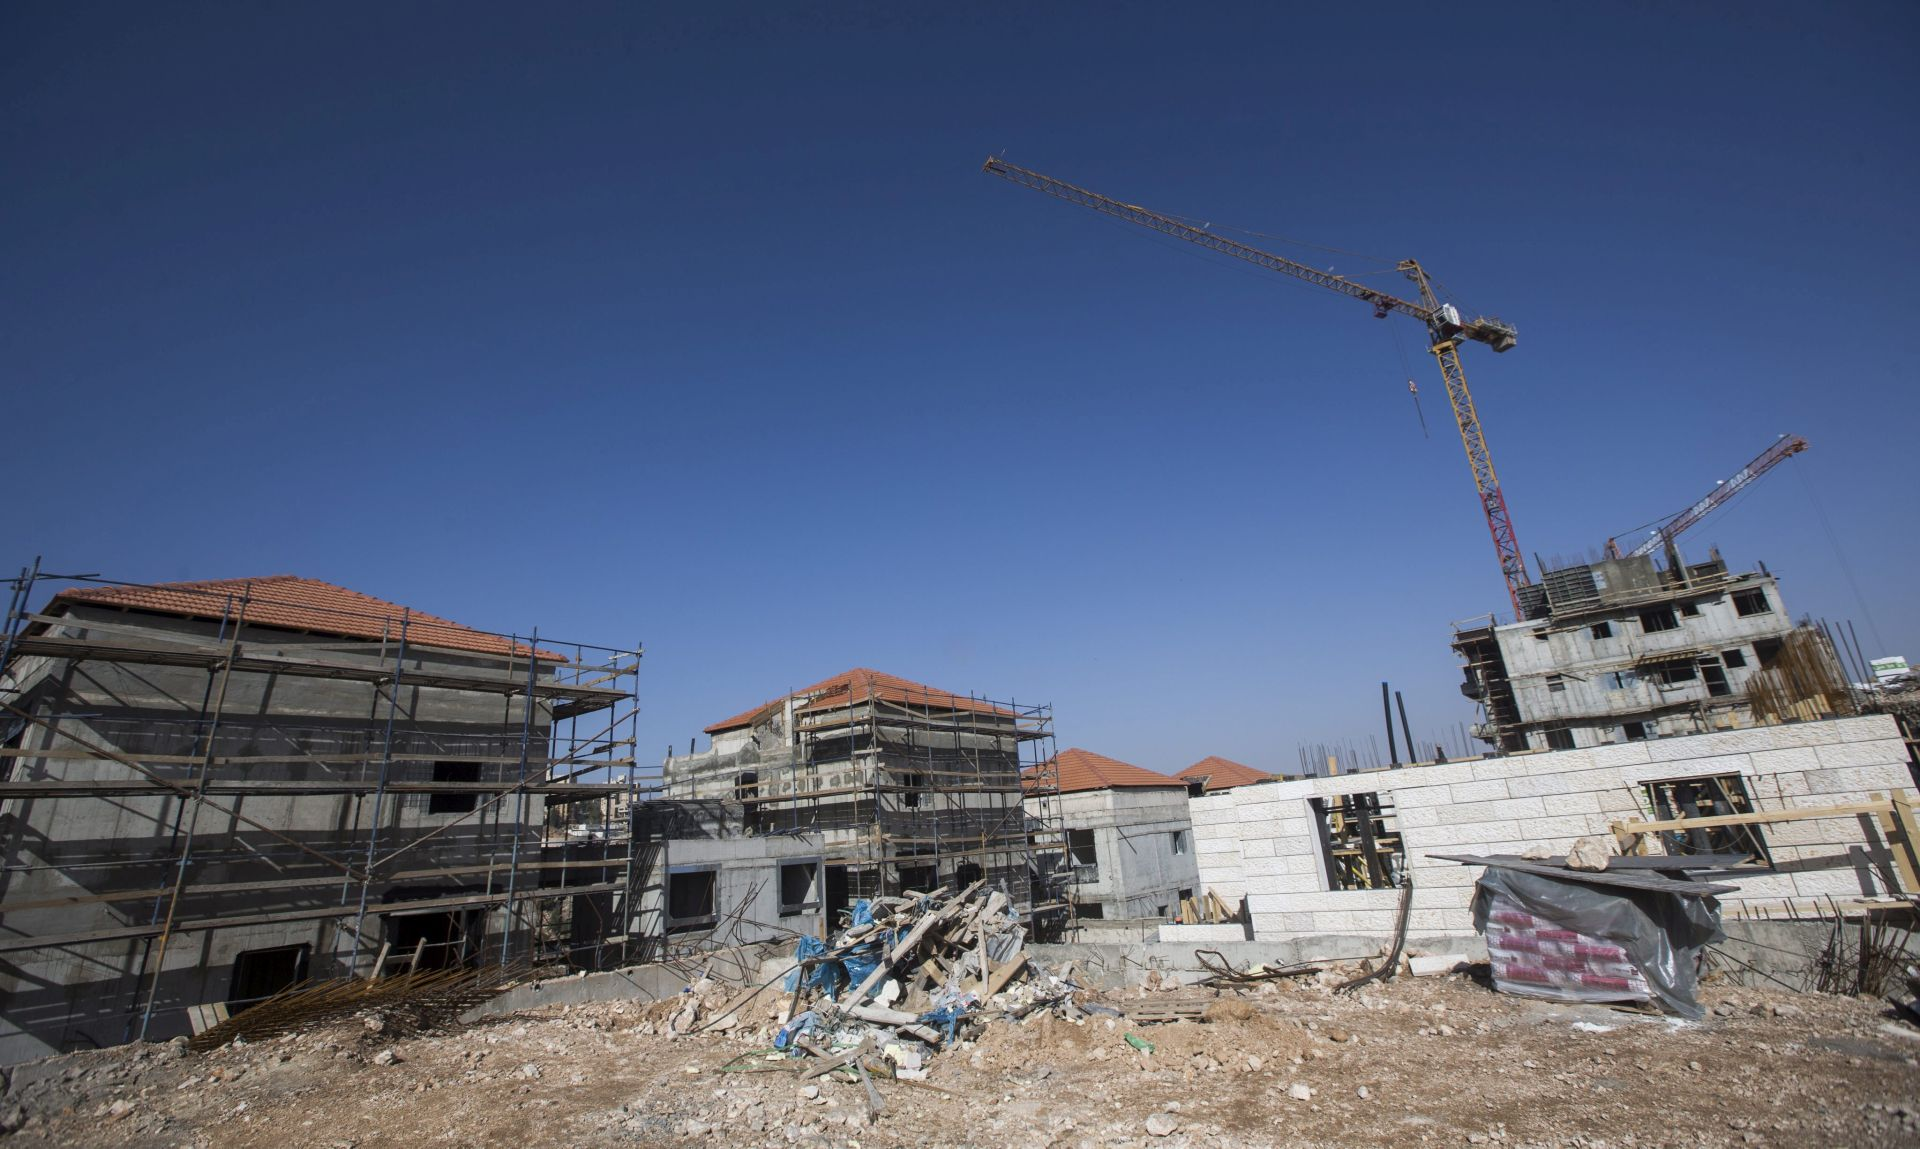 Abbas pozvao na raspravu o završetku izraelske okupacije Zapadne obale